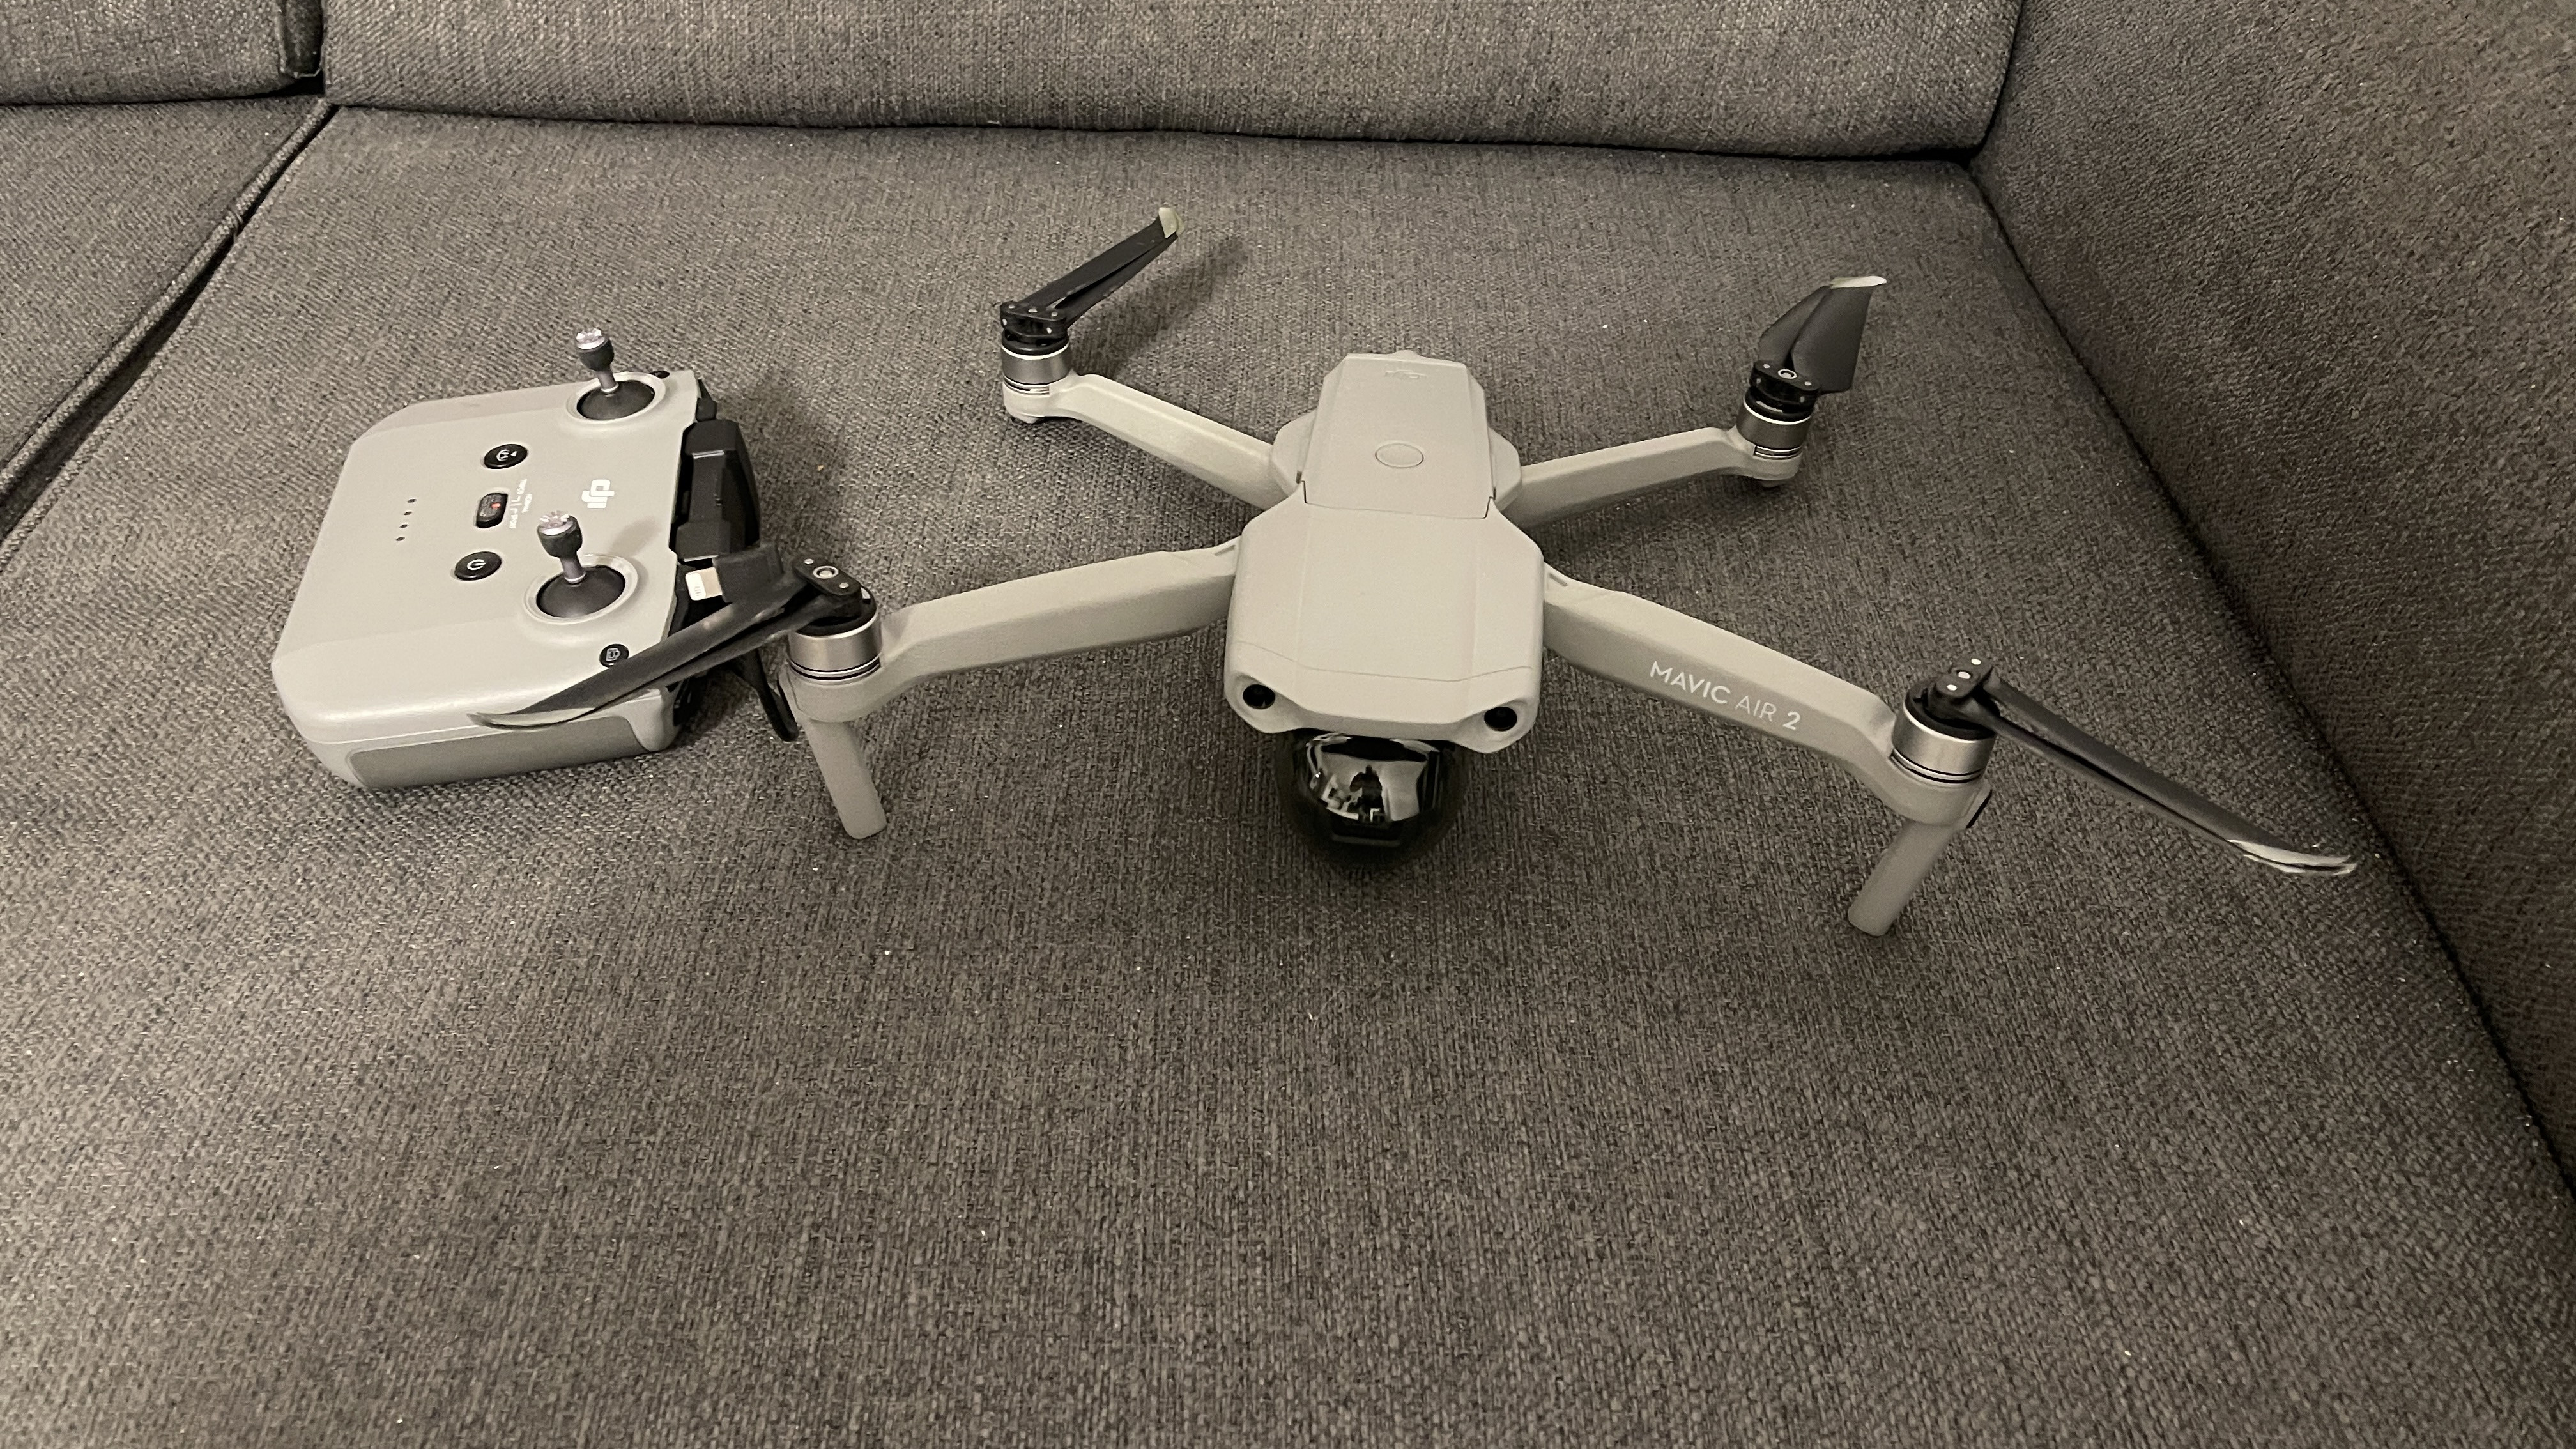 Vends drone DJI Mavic Air 2 fly more